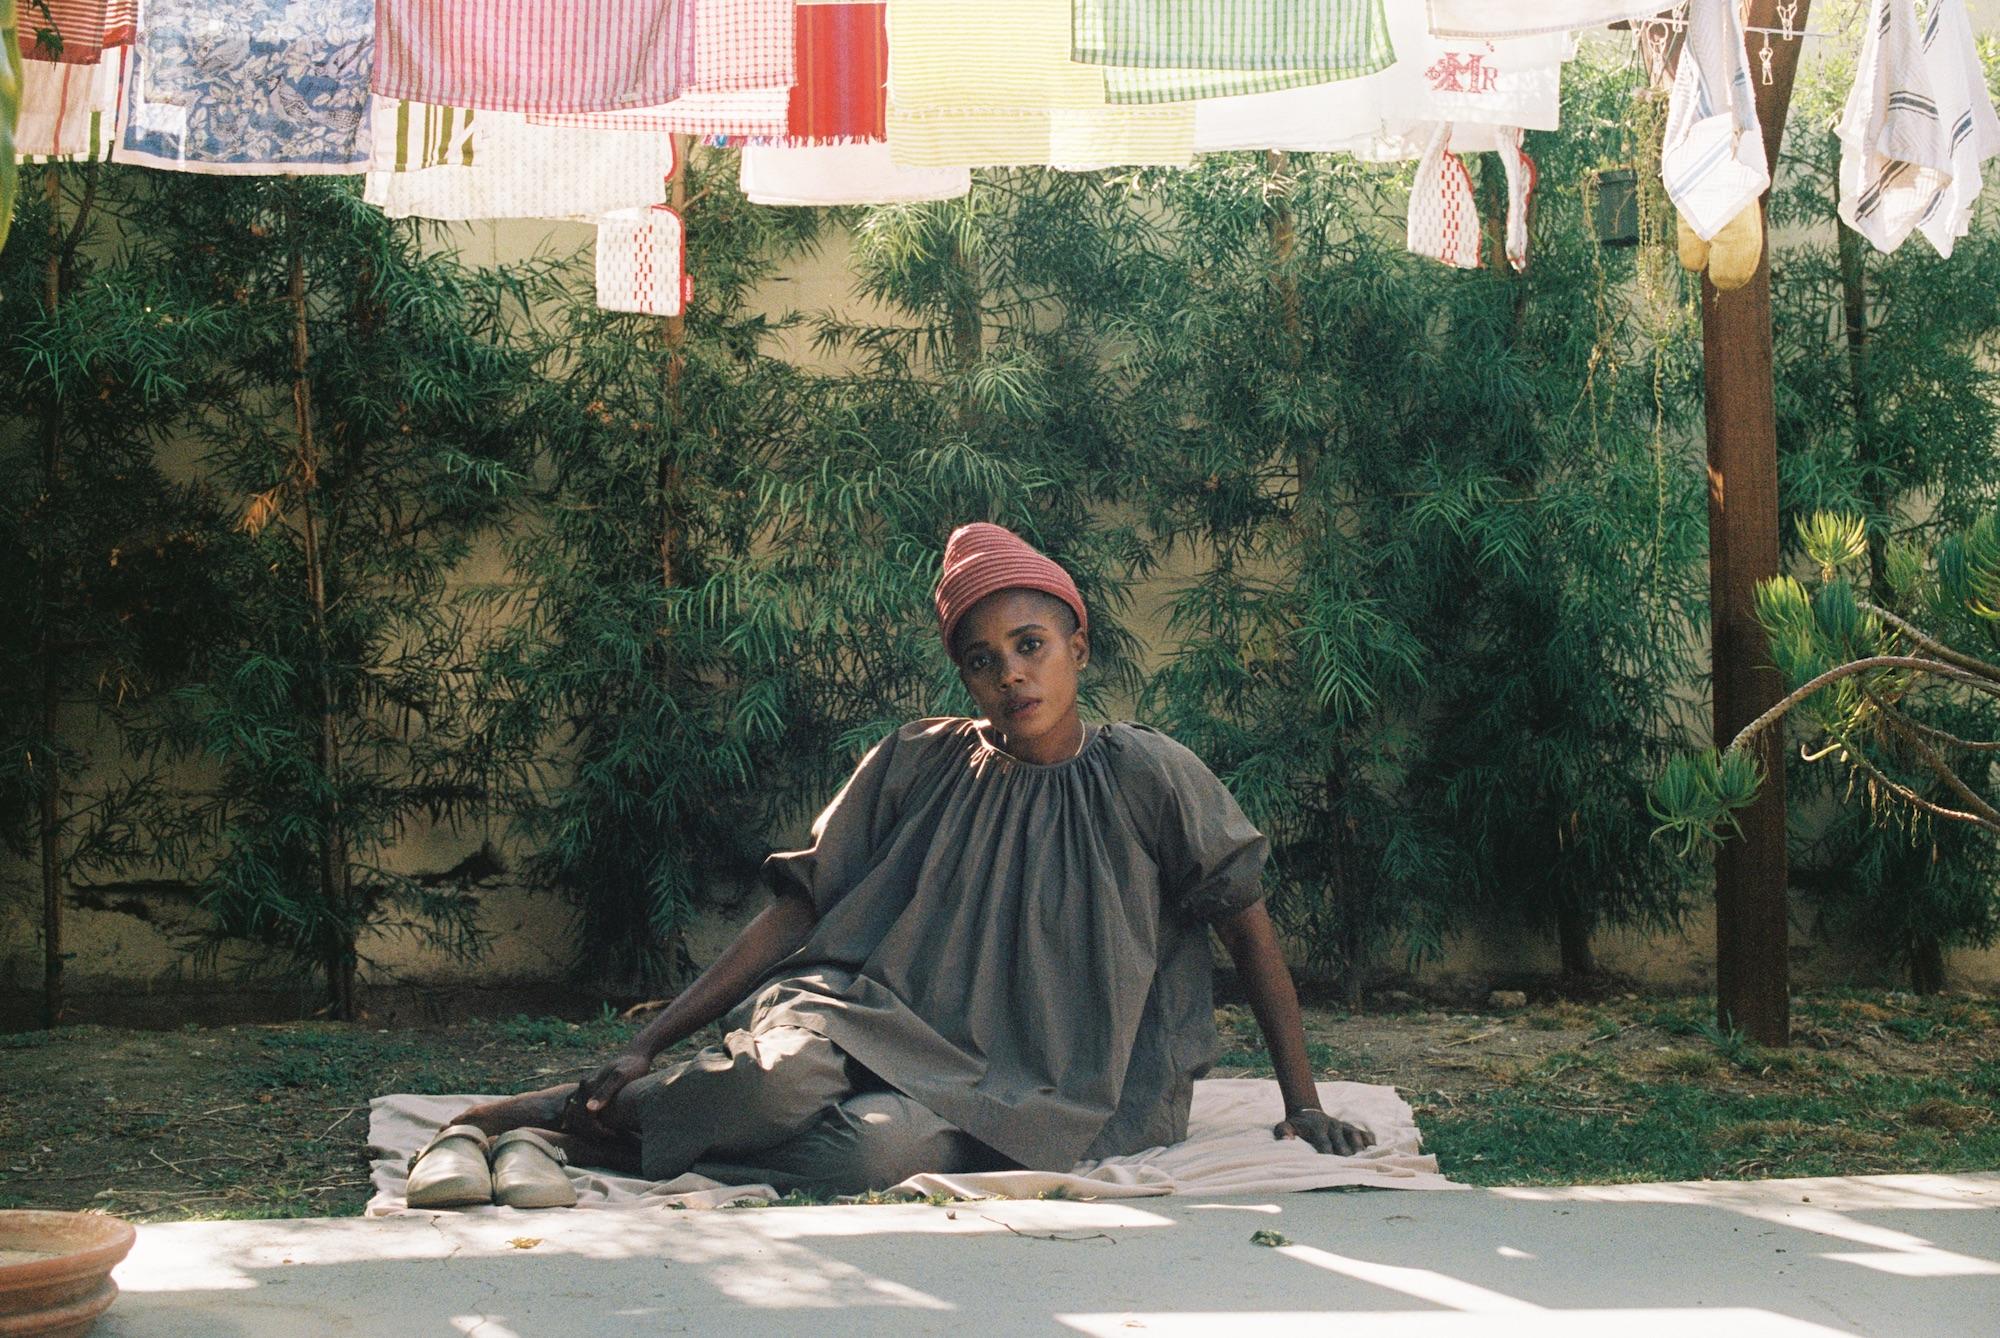 Woman sitting under clothesline